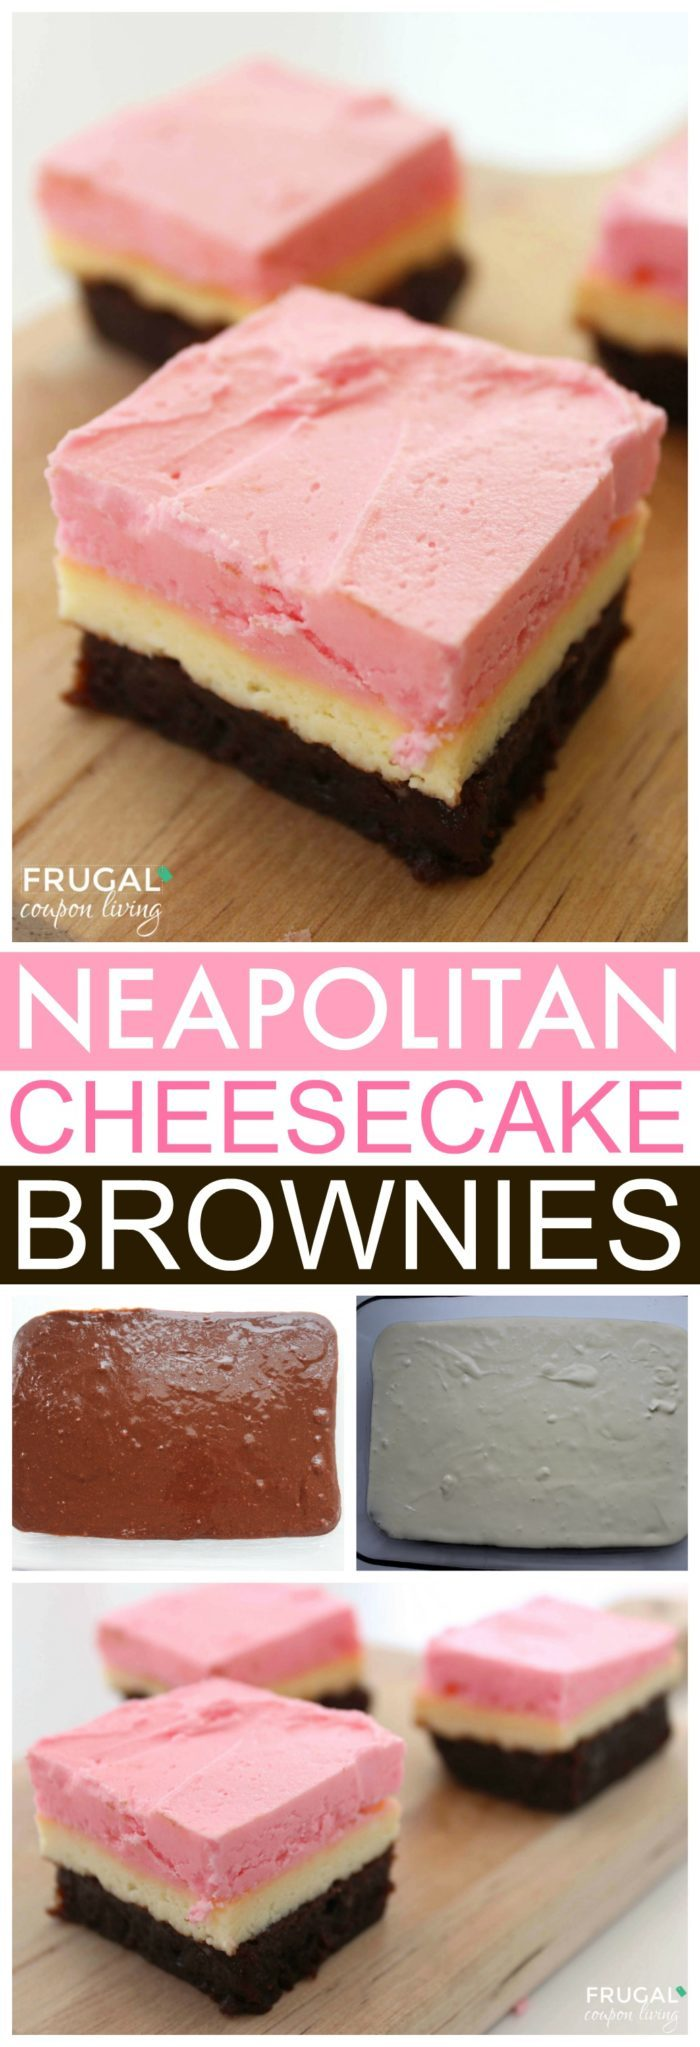 Neapolitan Cheesecake Brownies